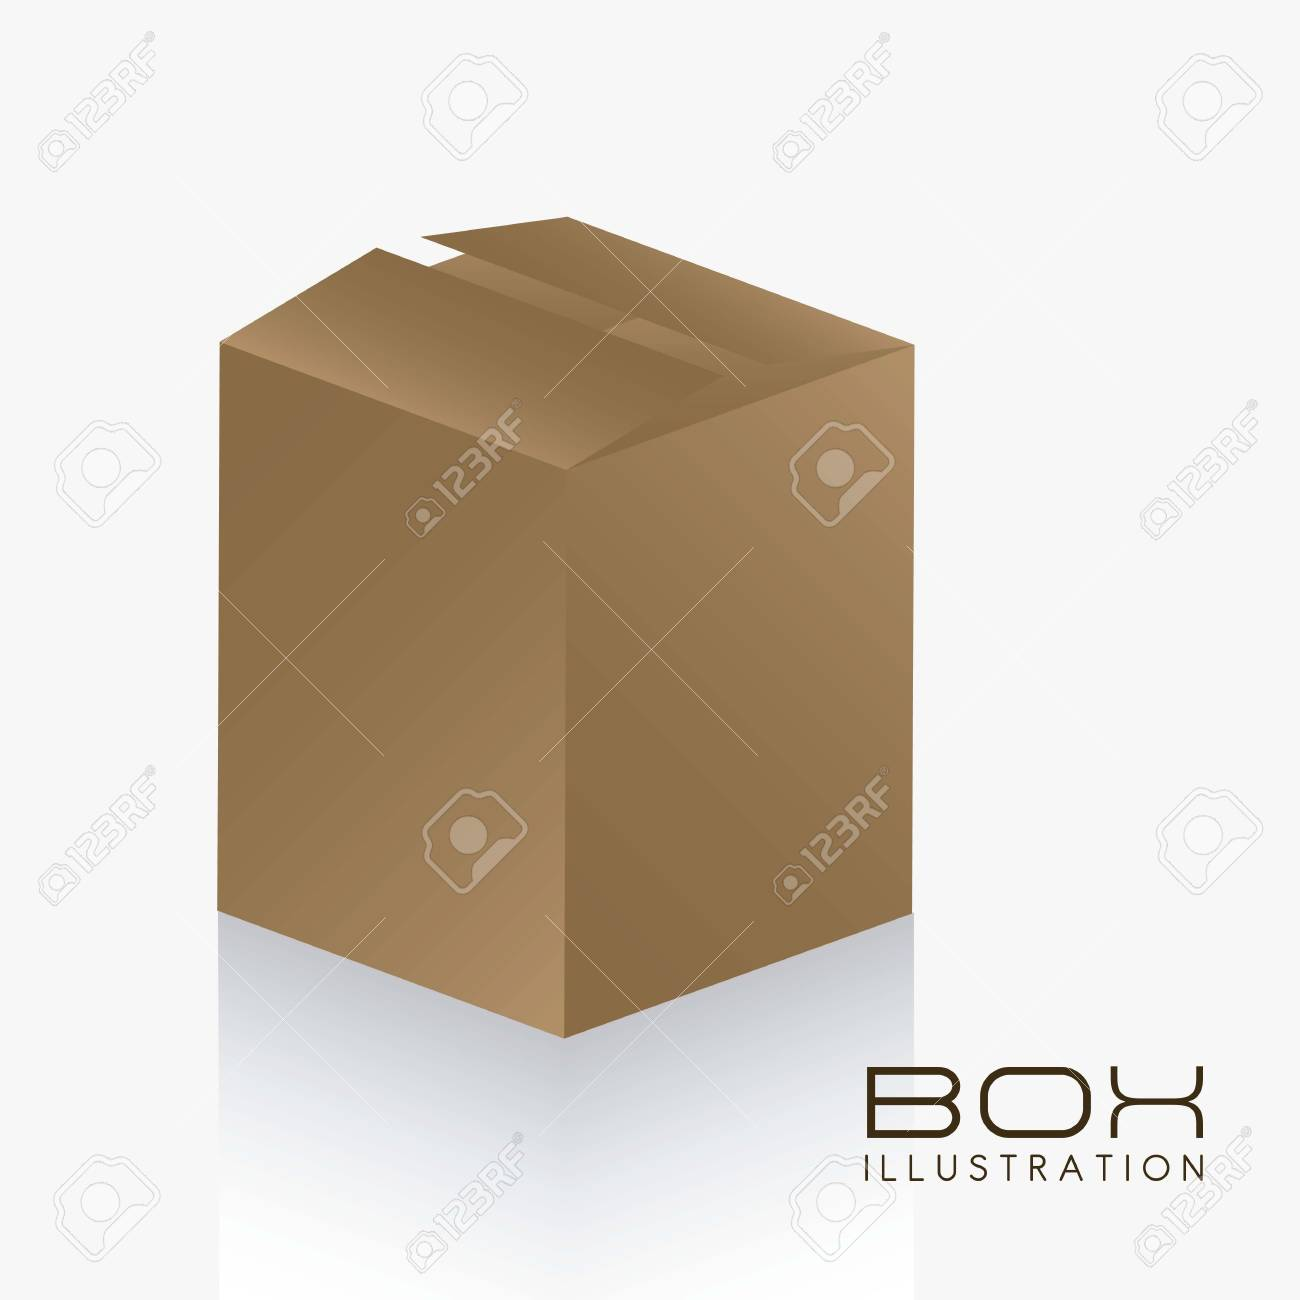 illustration of brown box on white background illustration Stock Vector - 14628022